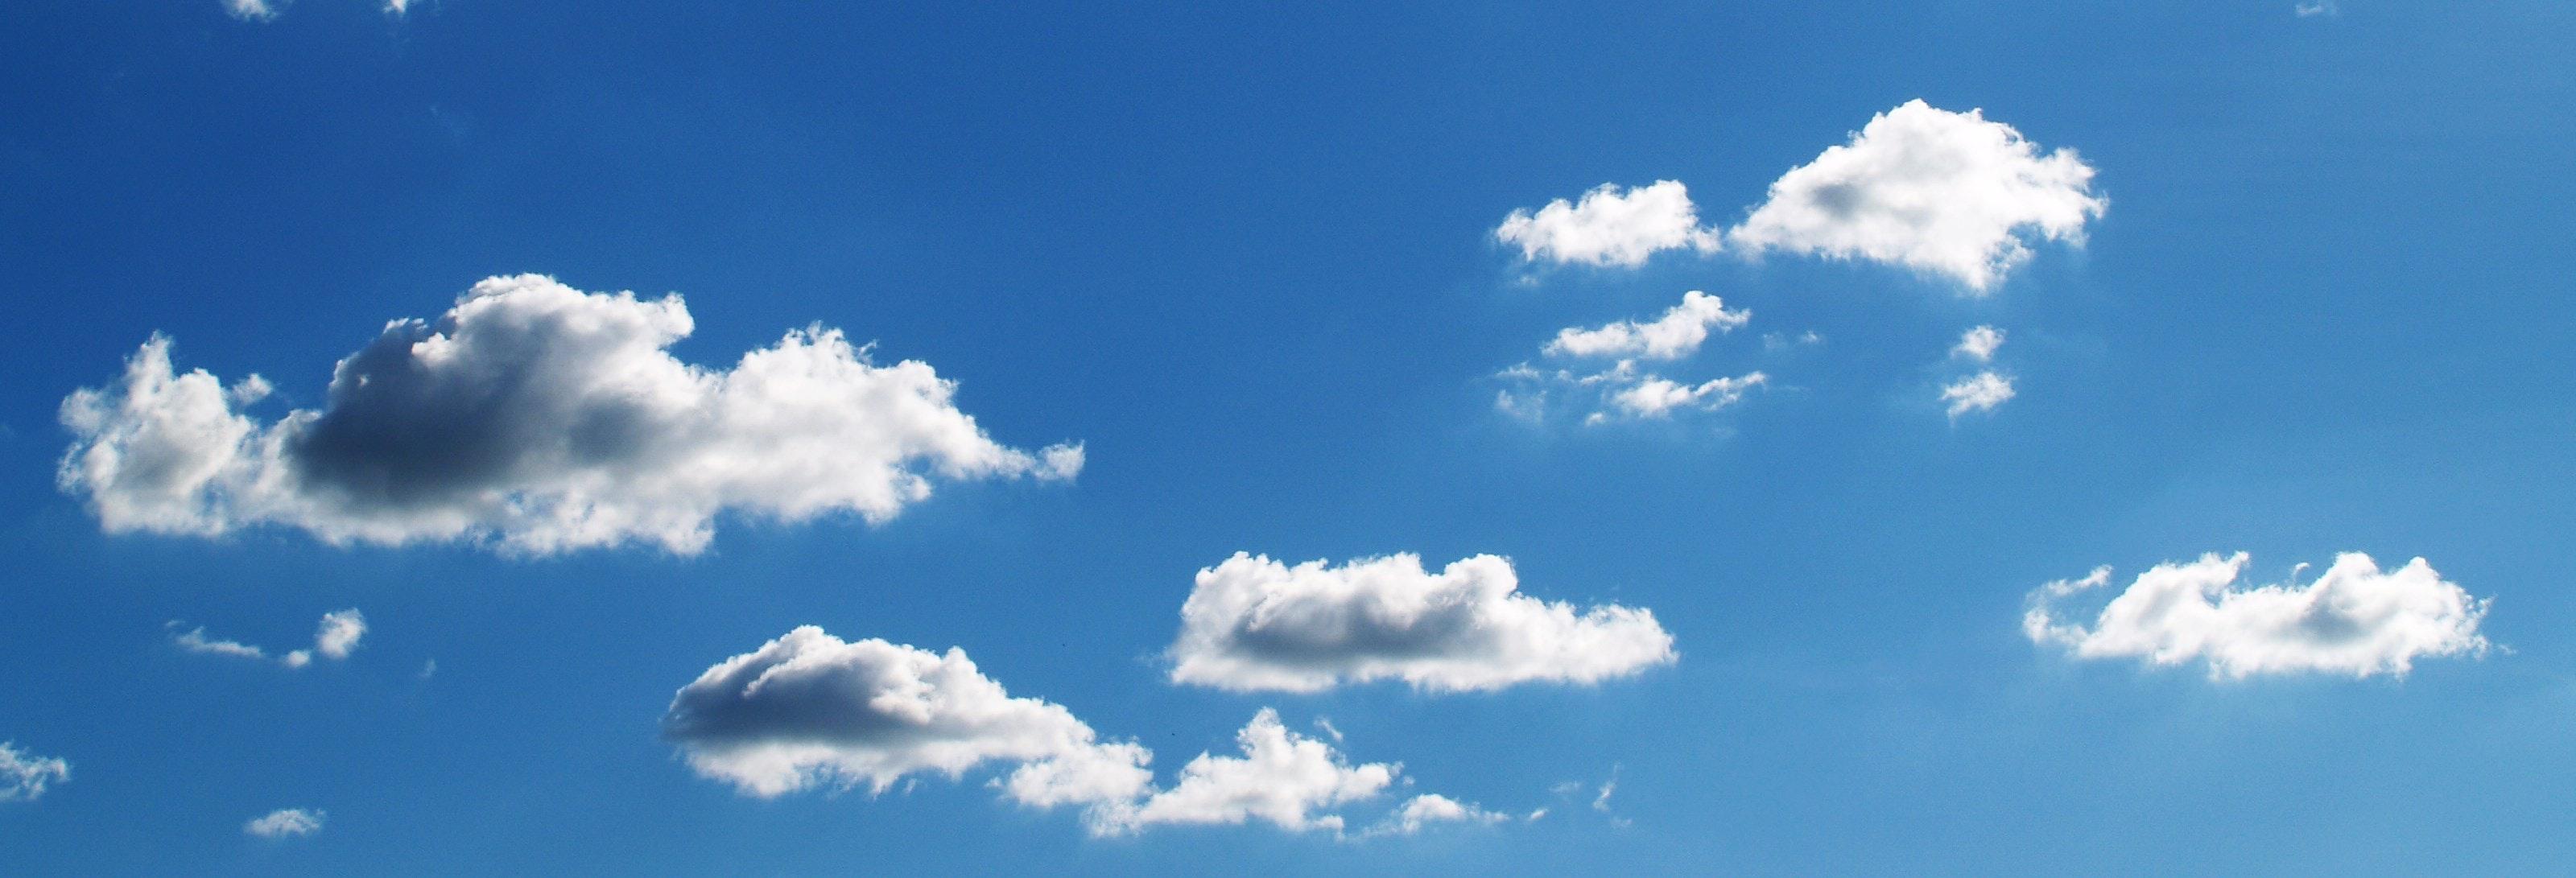 Free Images : nature, horizon, light, cloud, sunlight ...  |Light Blue Sky Clouds